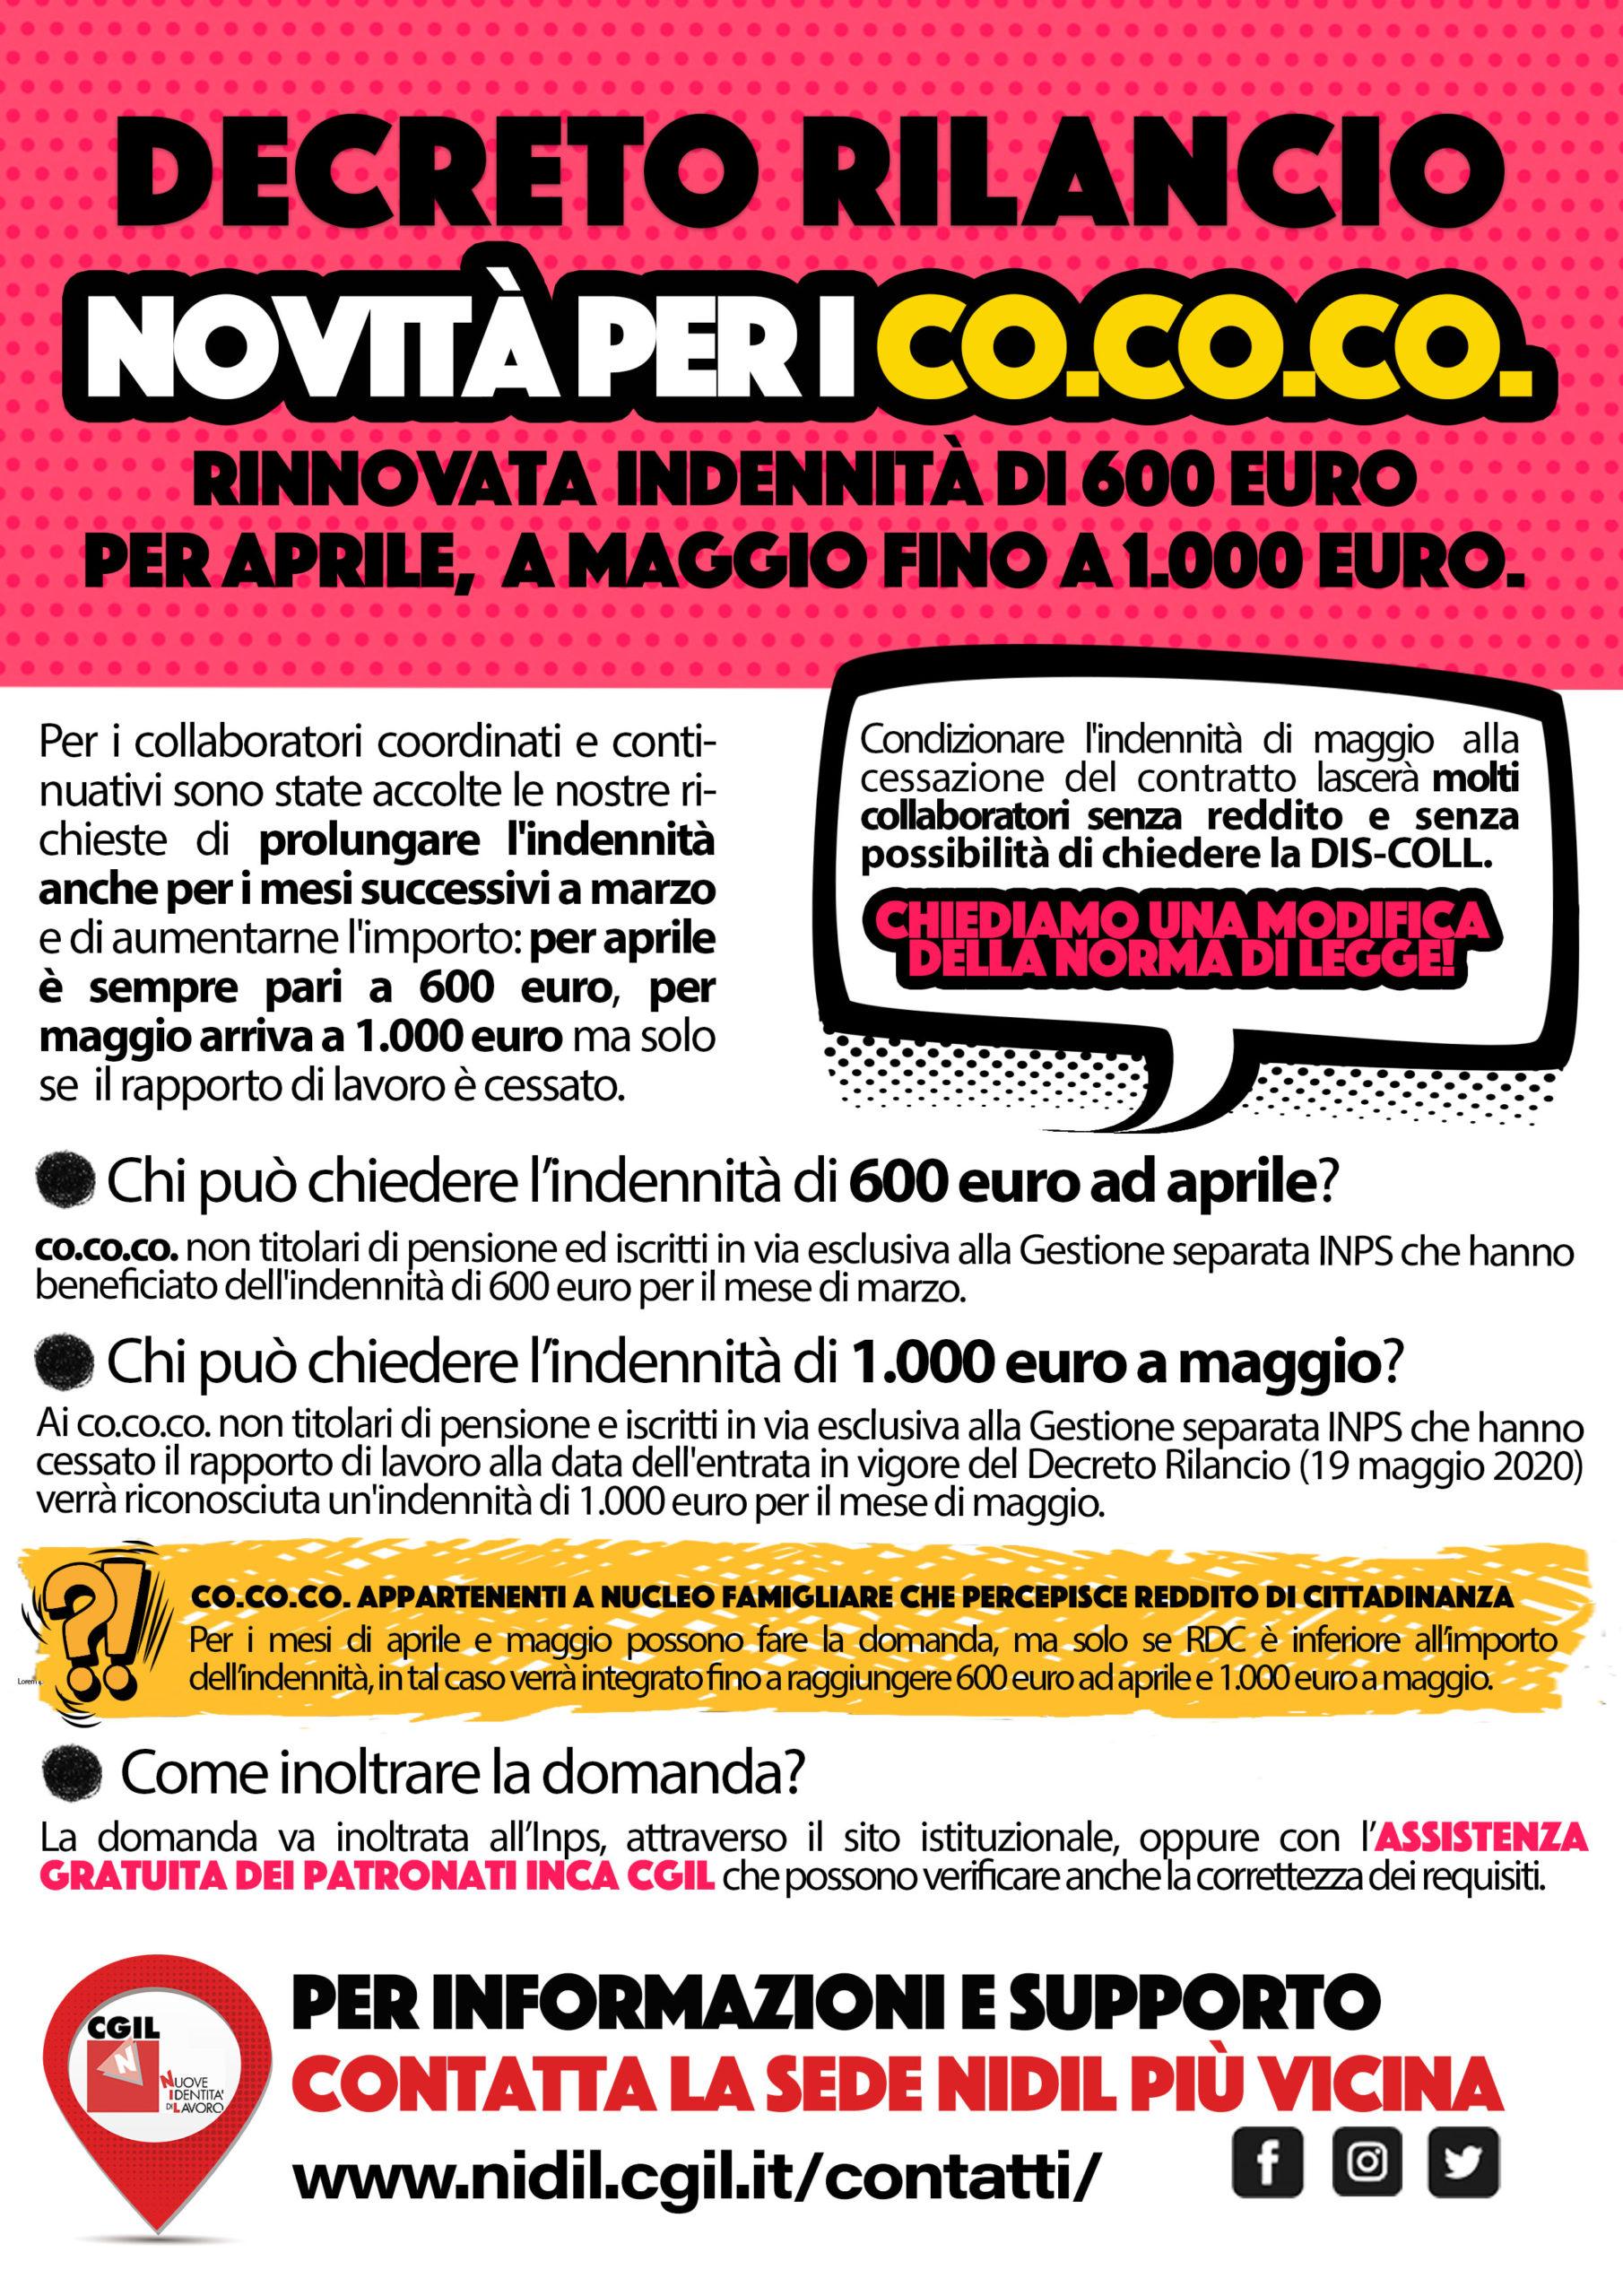 Decreto Rilancio Co.co.co.